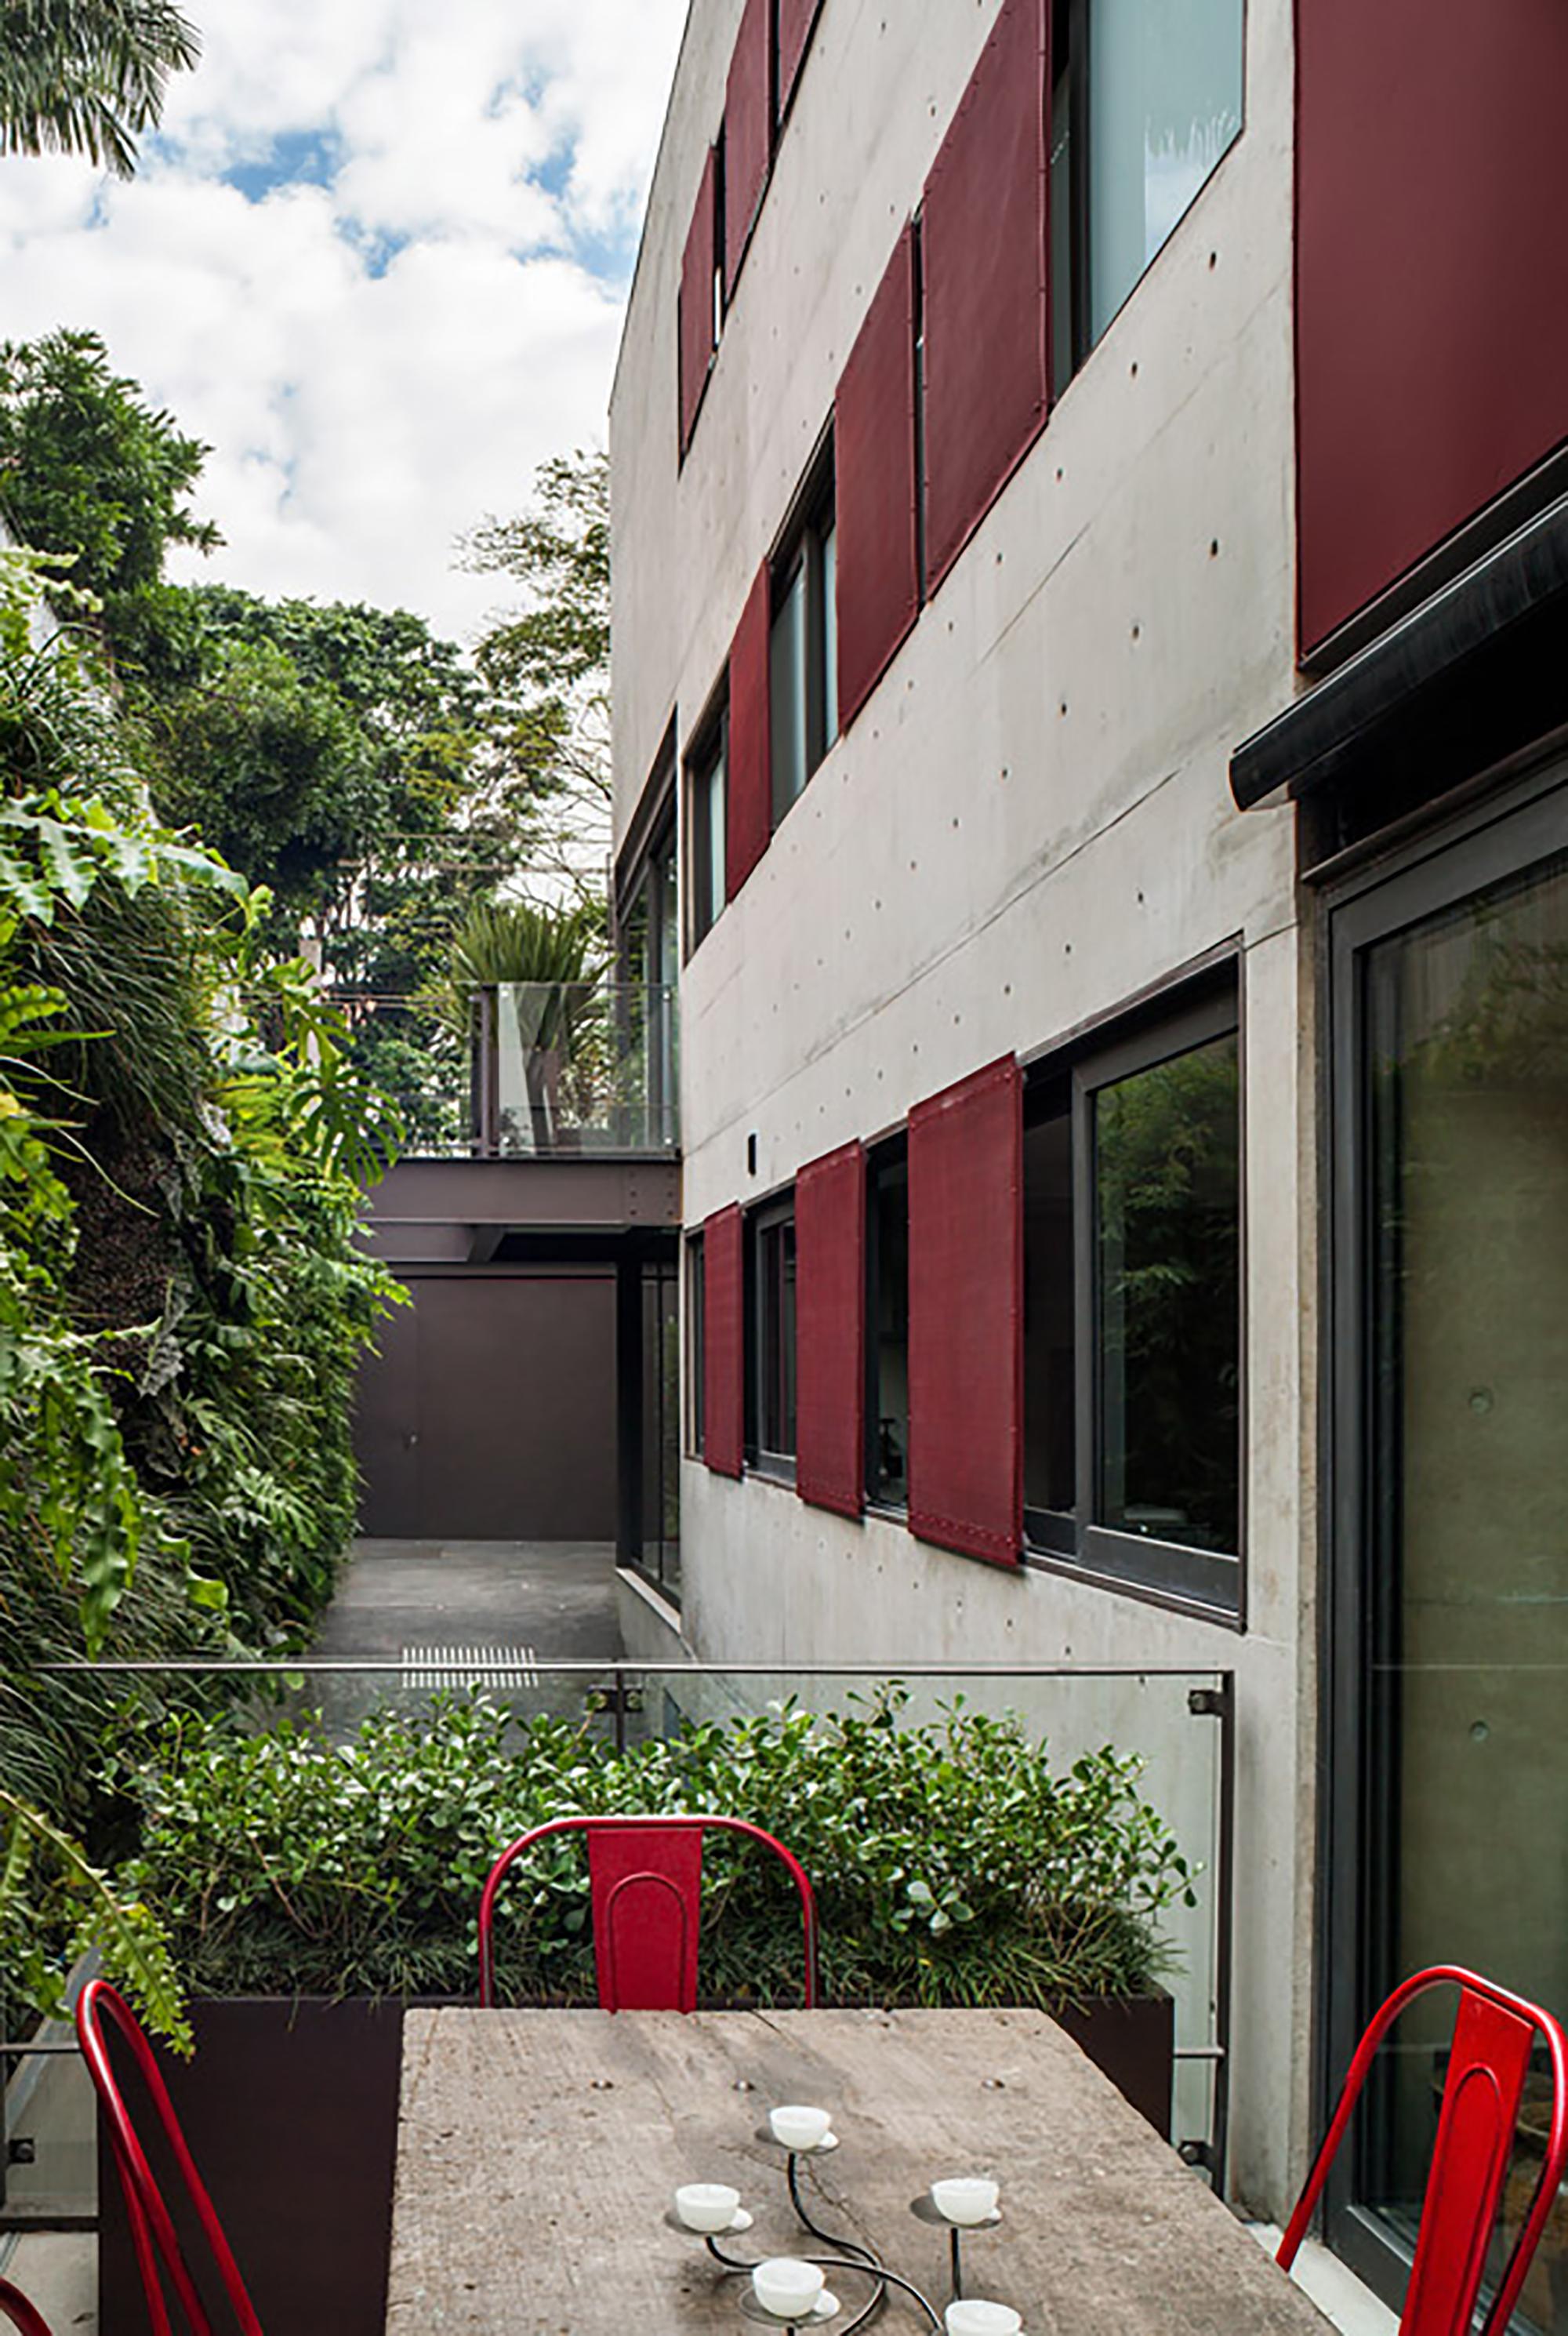 Galer a de casa jard n paulistano gruposp 15 for Cd market galeria jardin